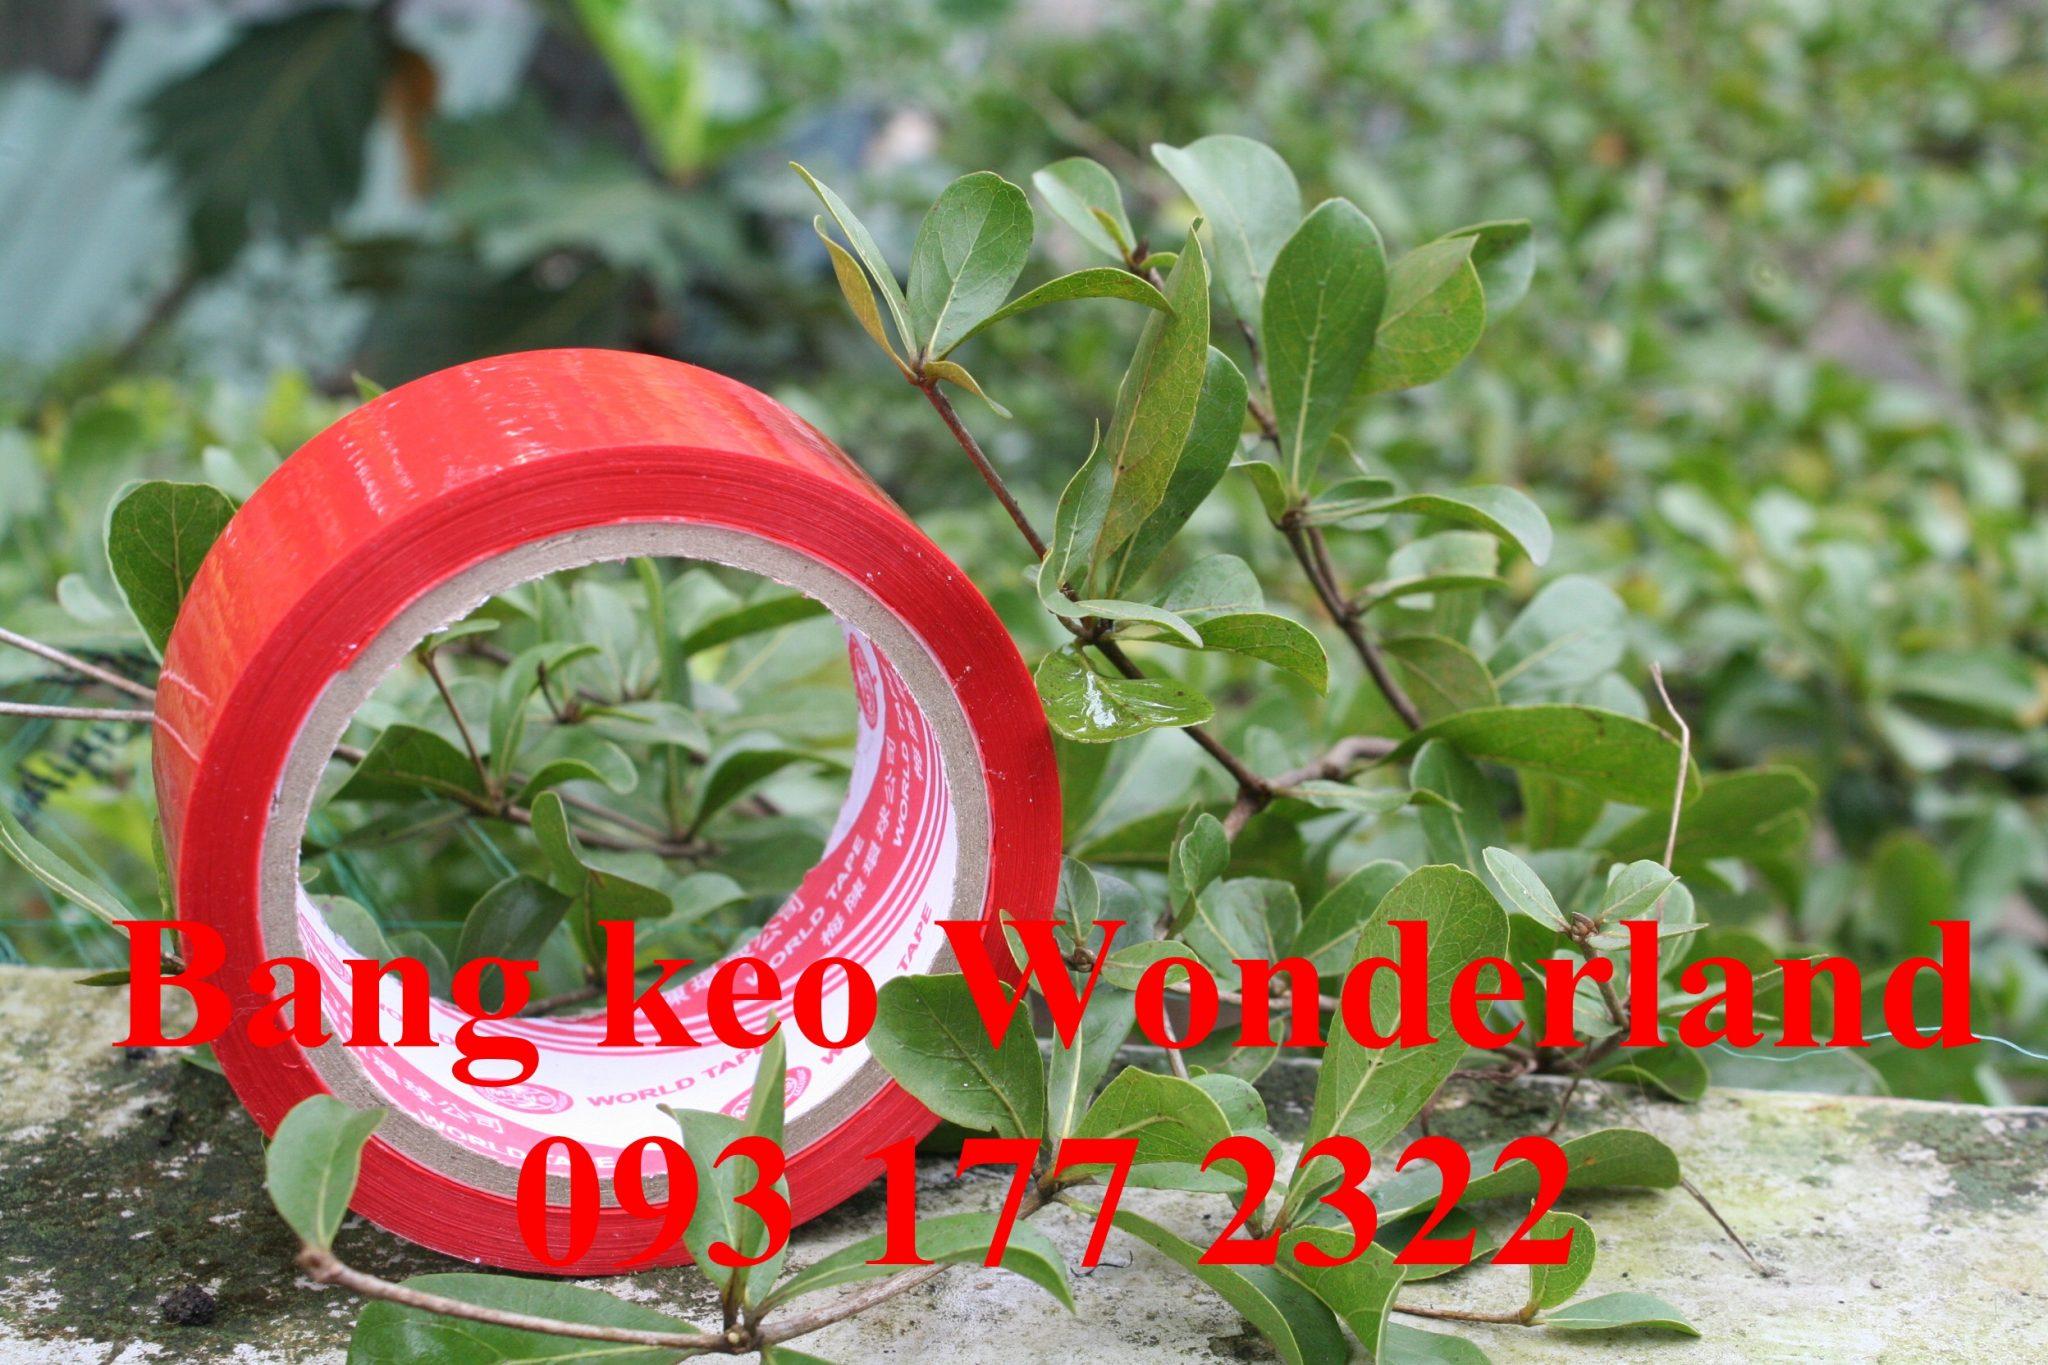 bang-keo-wonderland